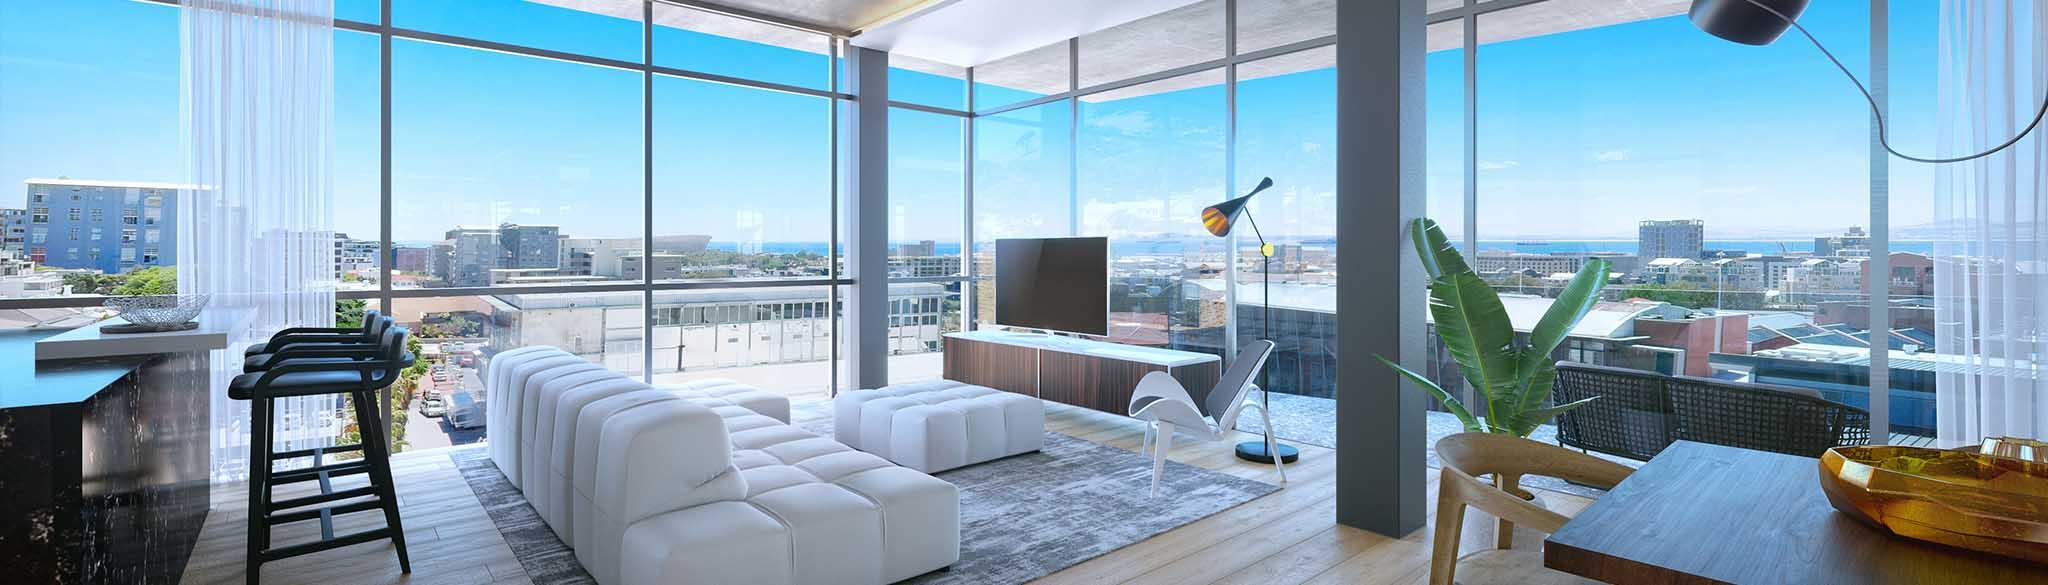 The Quarter Apartment Penthouse